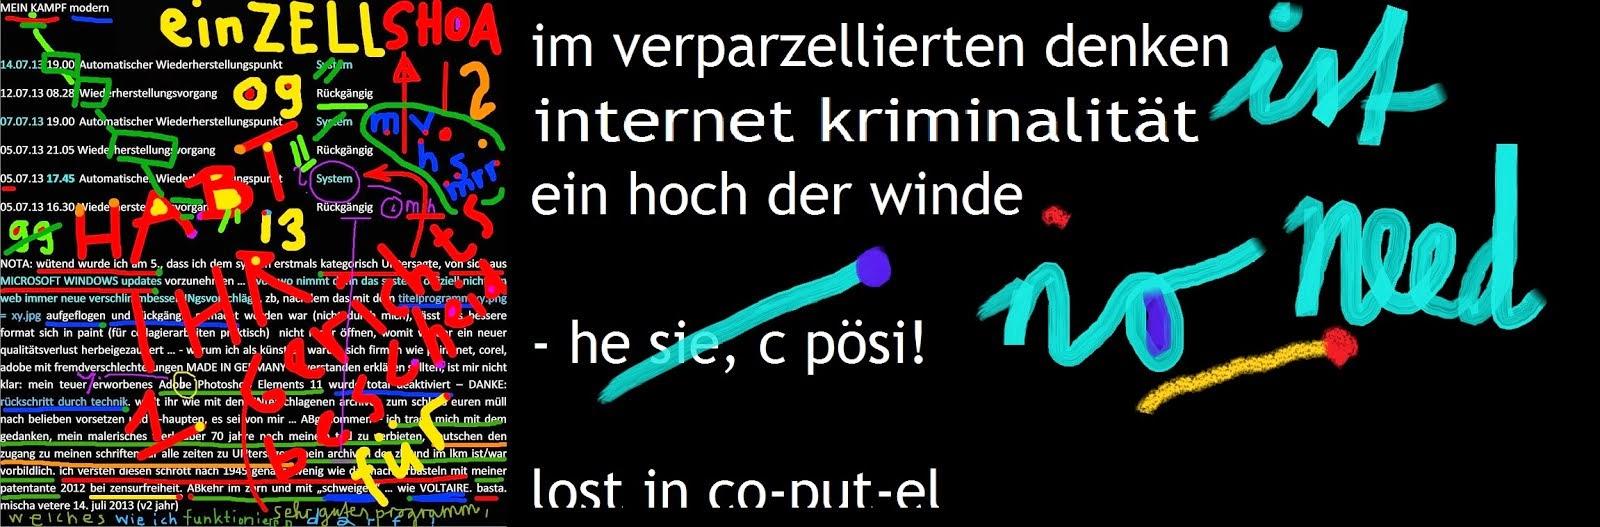 microsoft hacking stalking deutsche telekom gegen nichtkunden rubbery andalism ART prolitteris gema